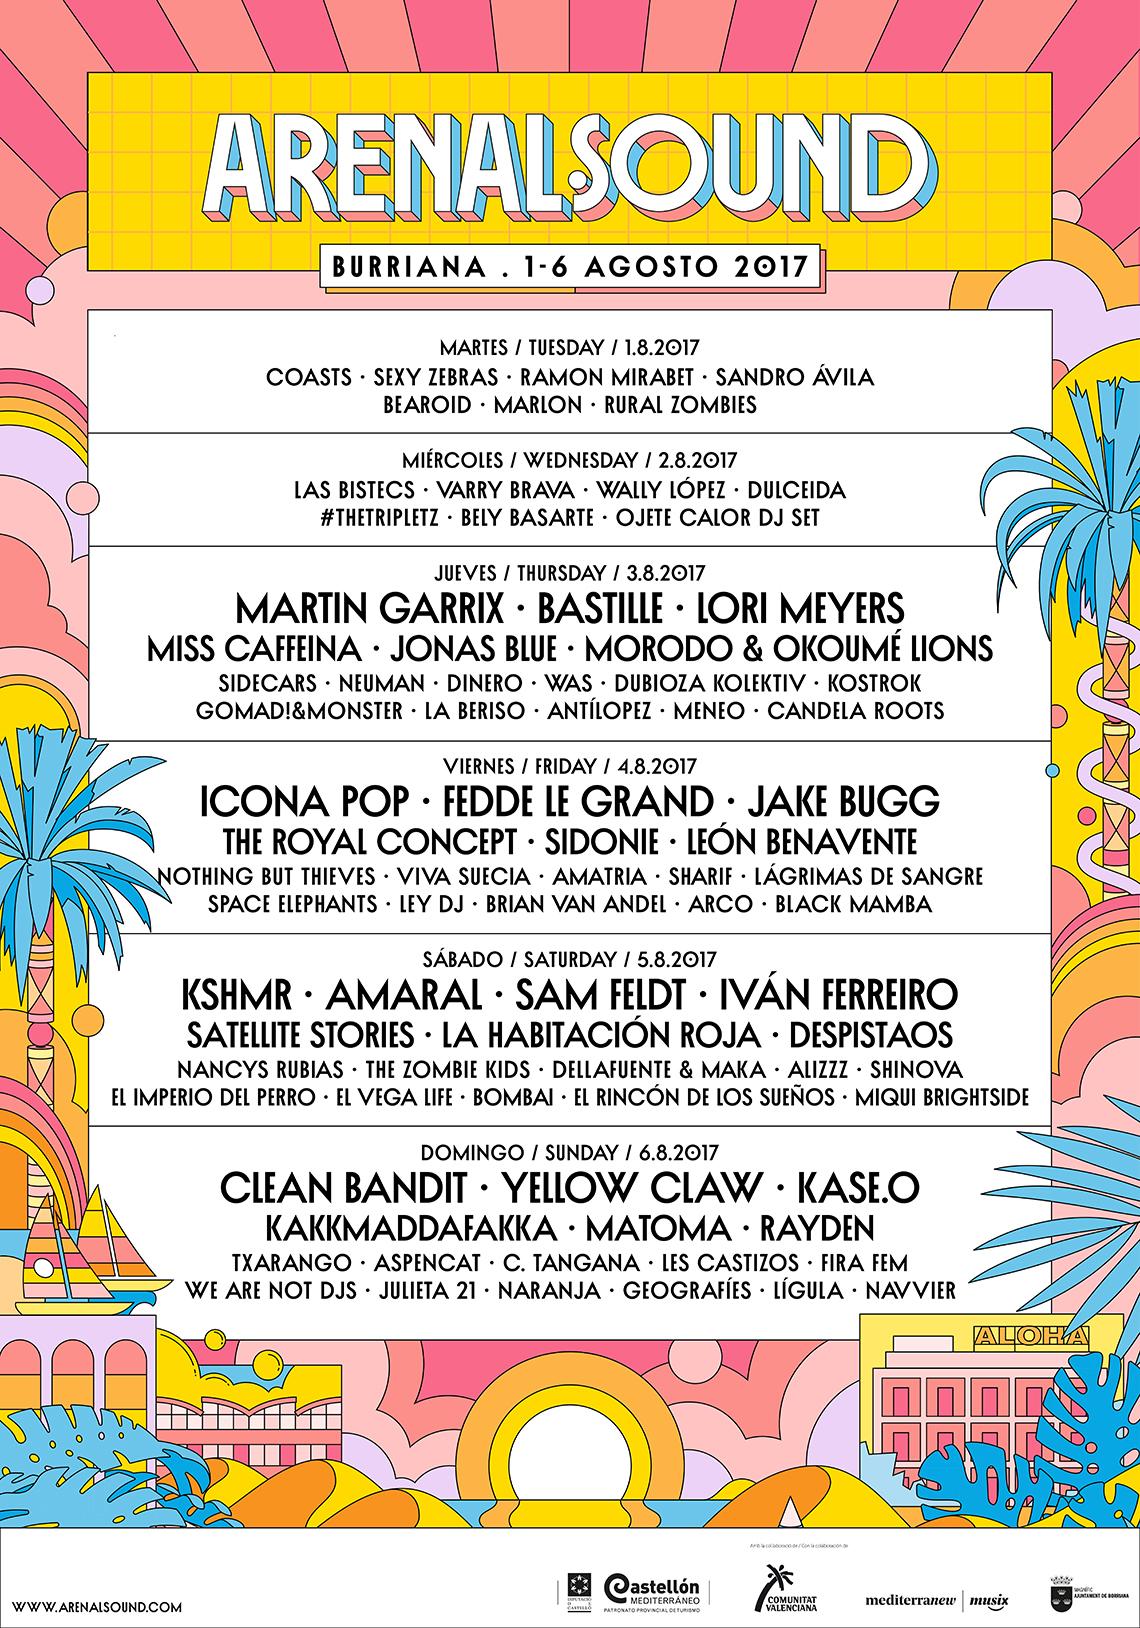 Cartel completo del Arenal Sound 2017